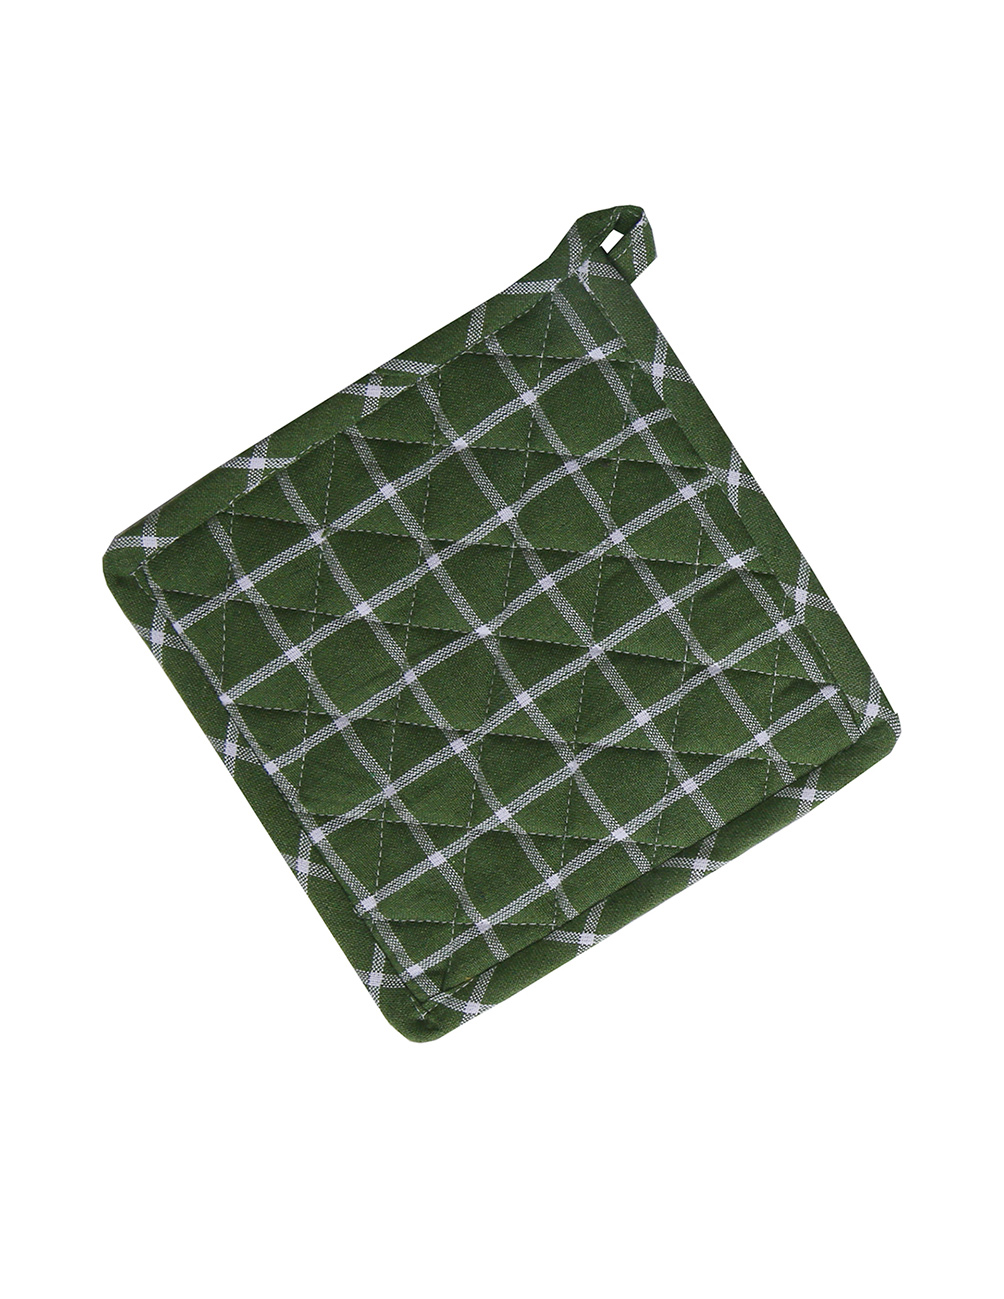 Potholder Recycled Green/White Checkered